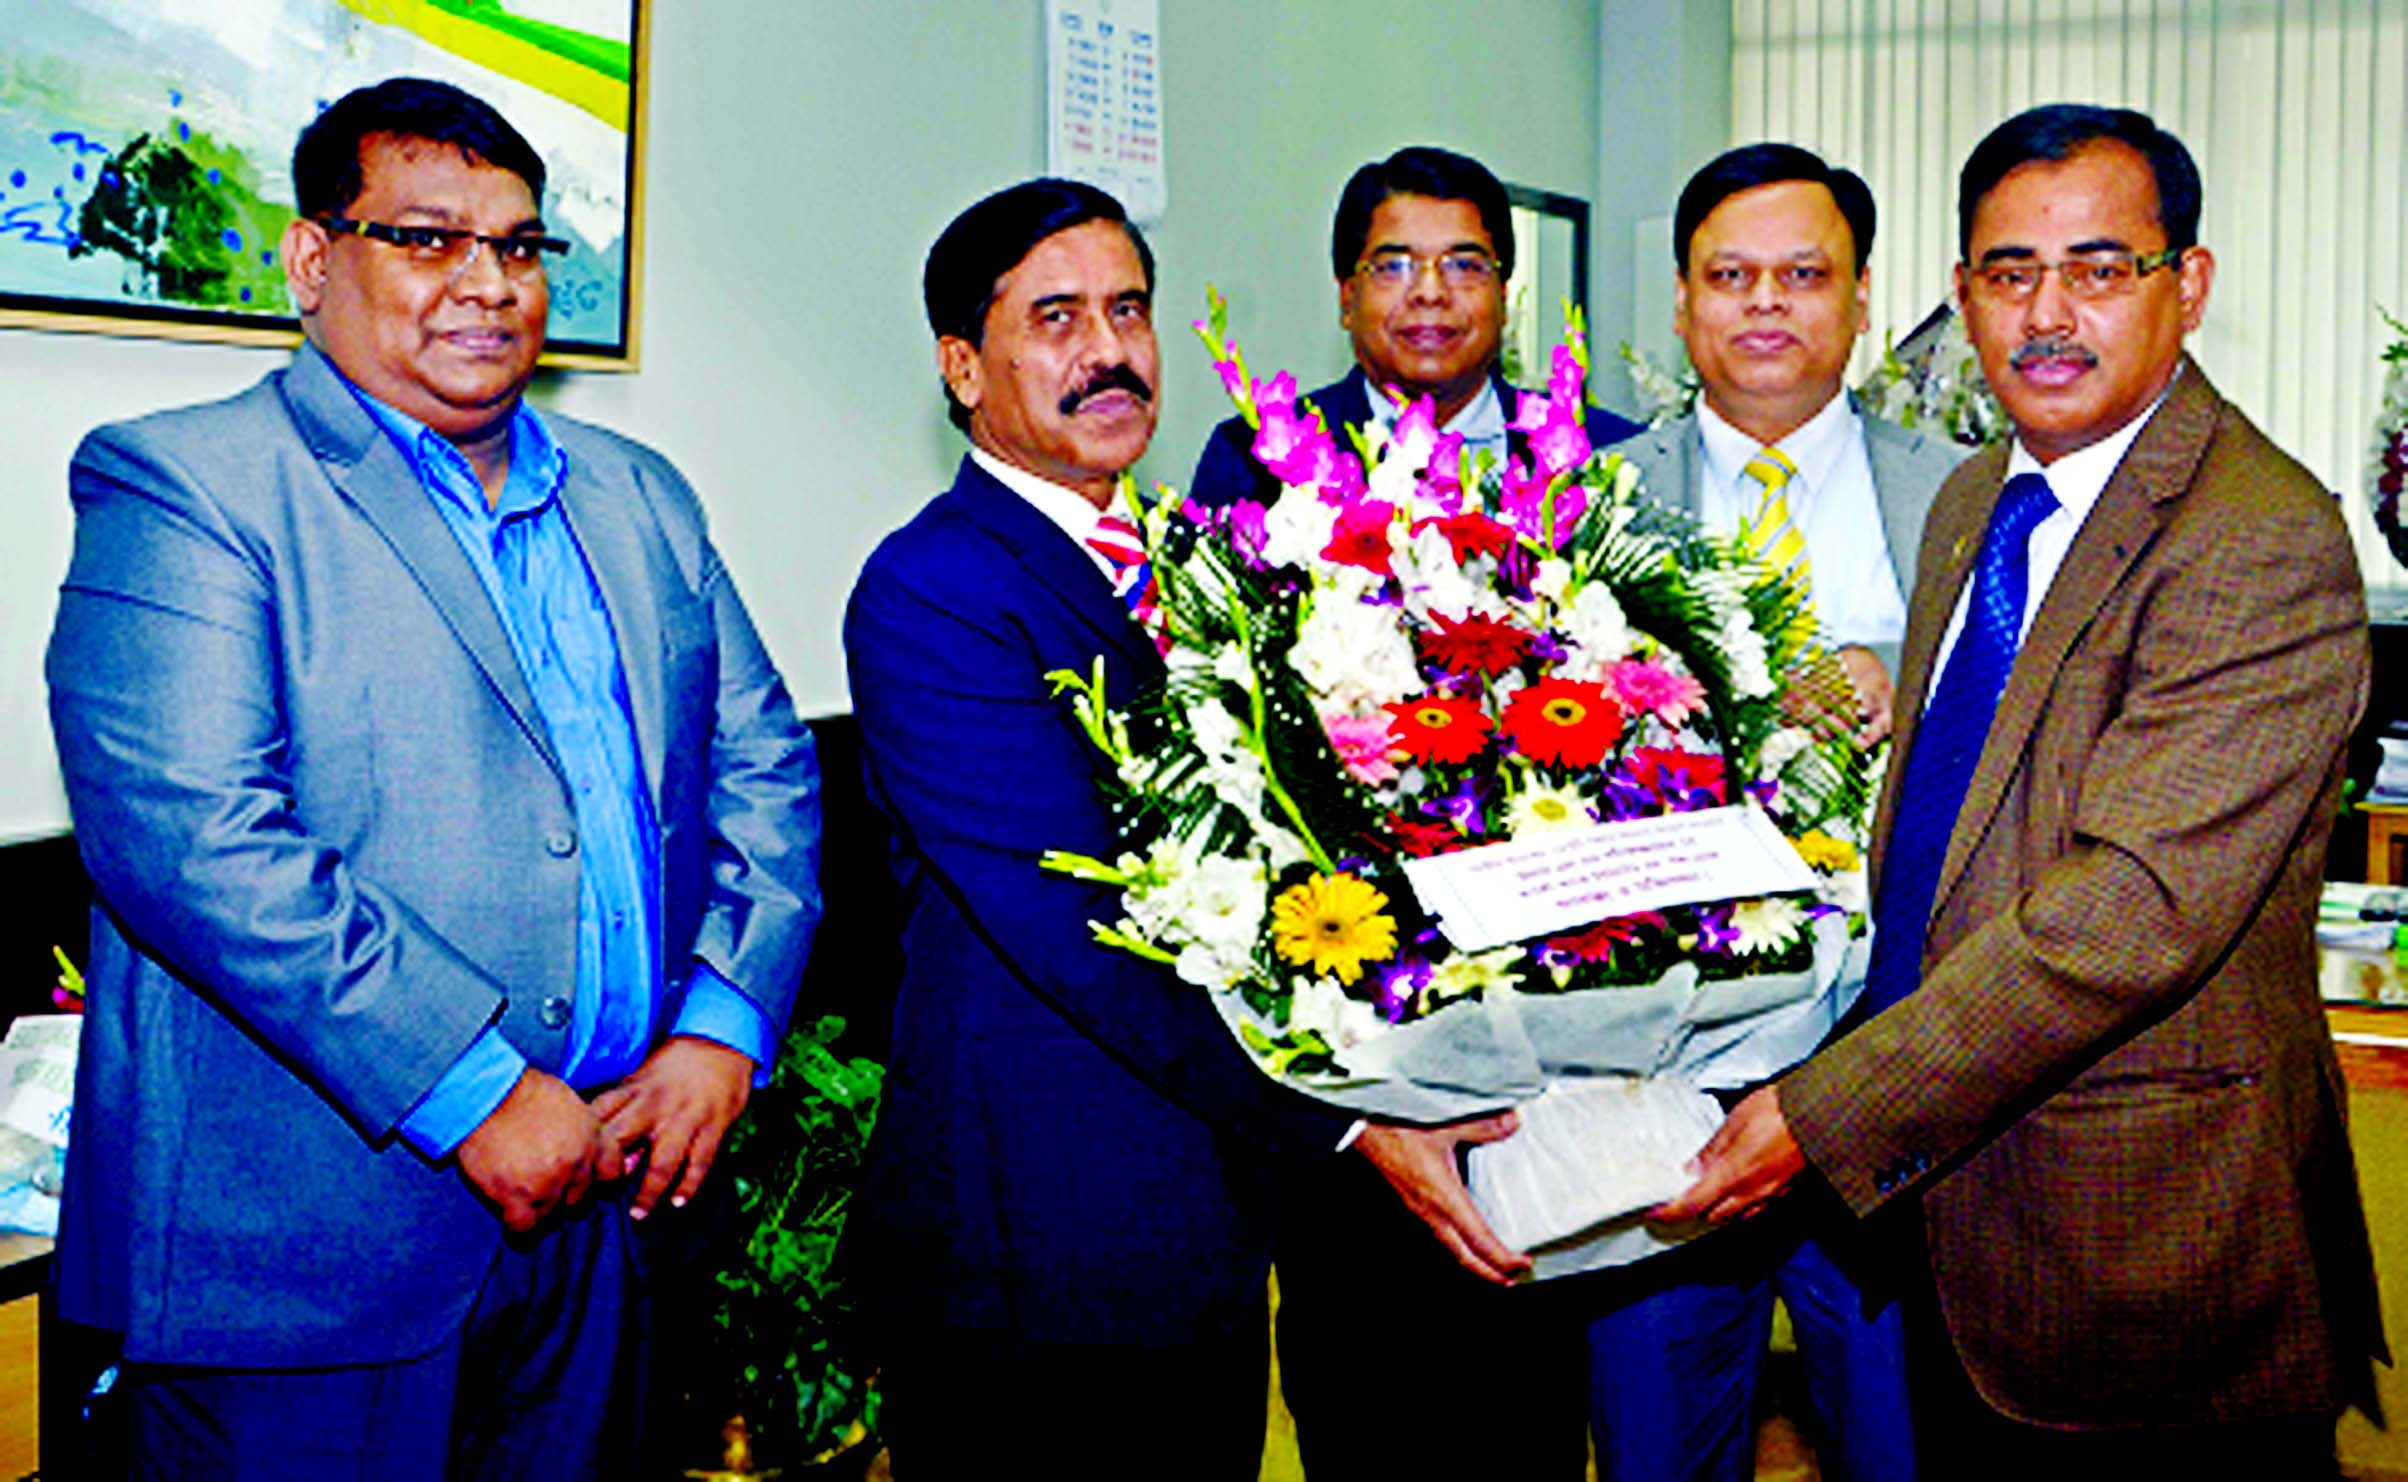 Md Ataur Rahman Prodhan, Managing Director and CEO of Rupali Bank ...